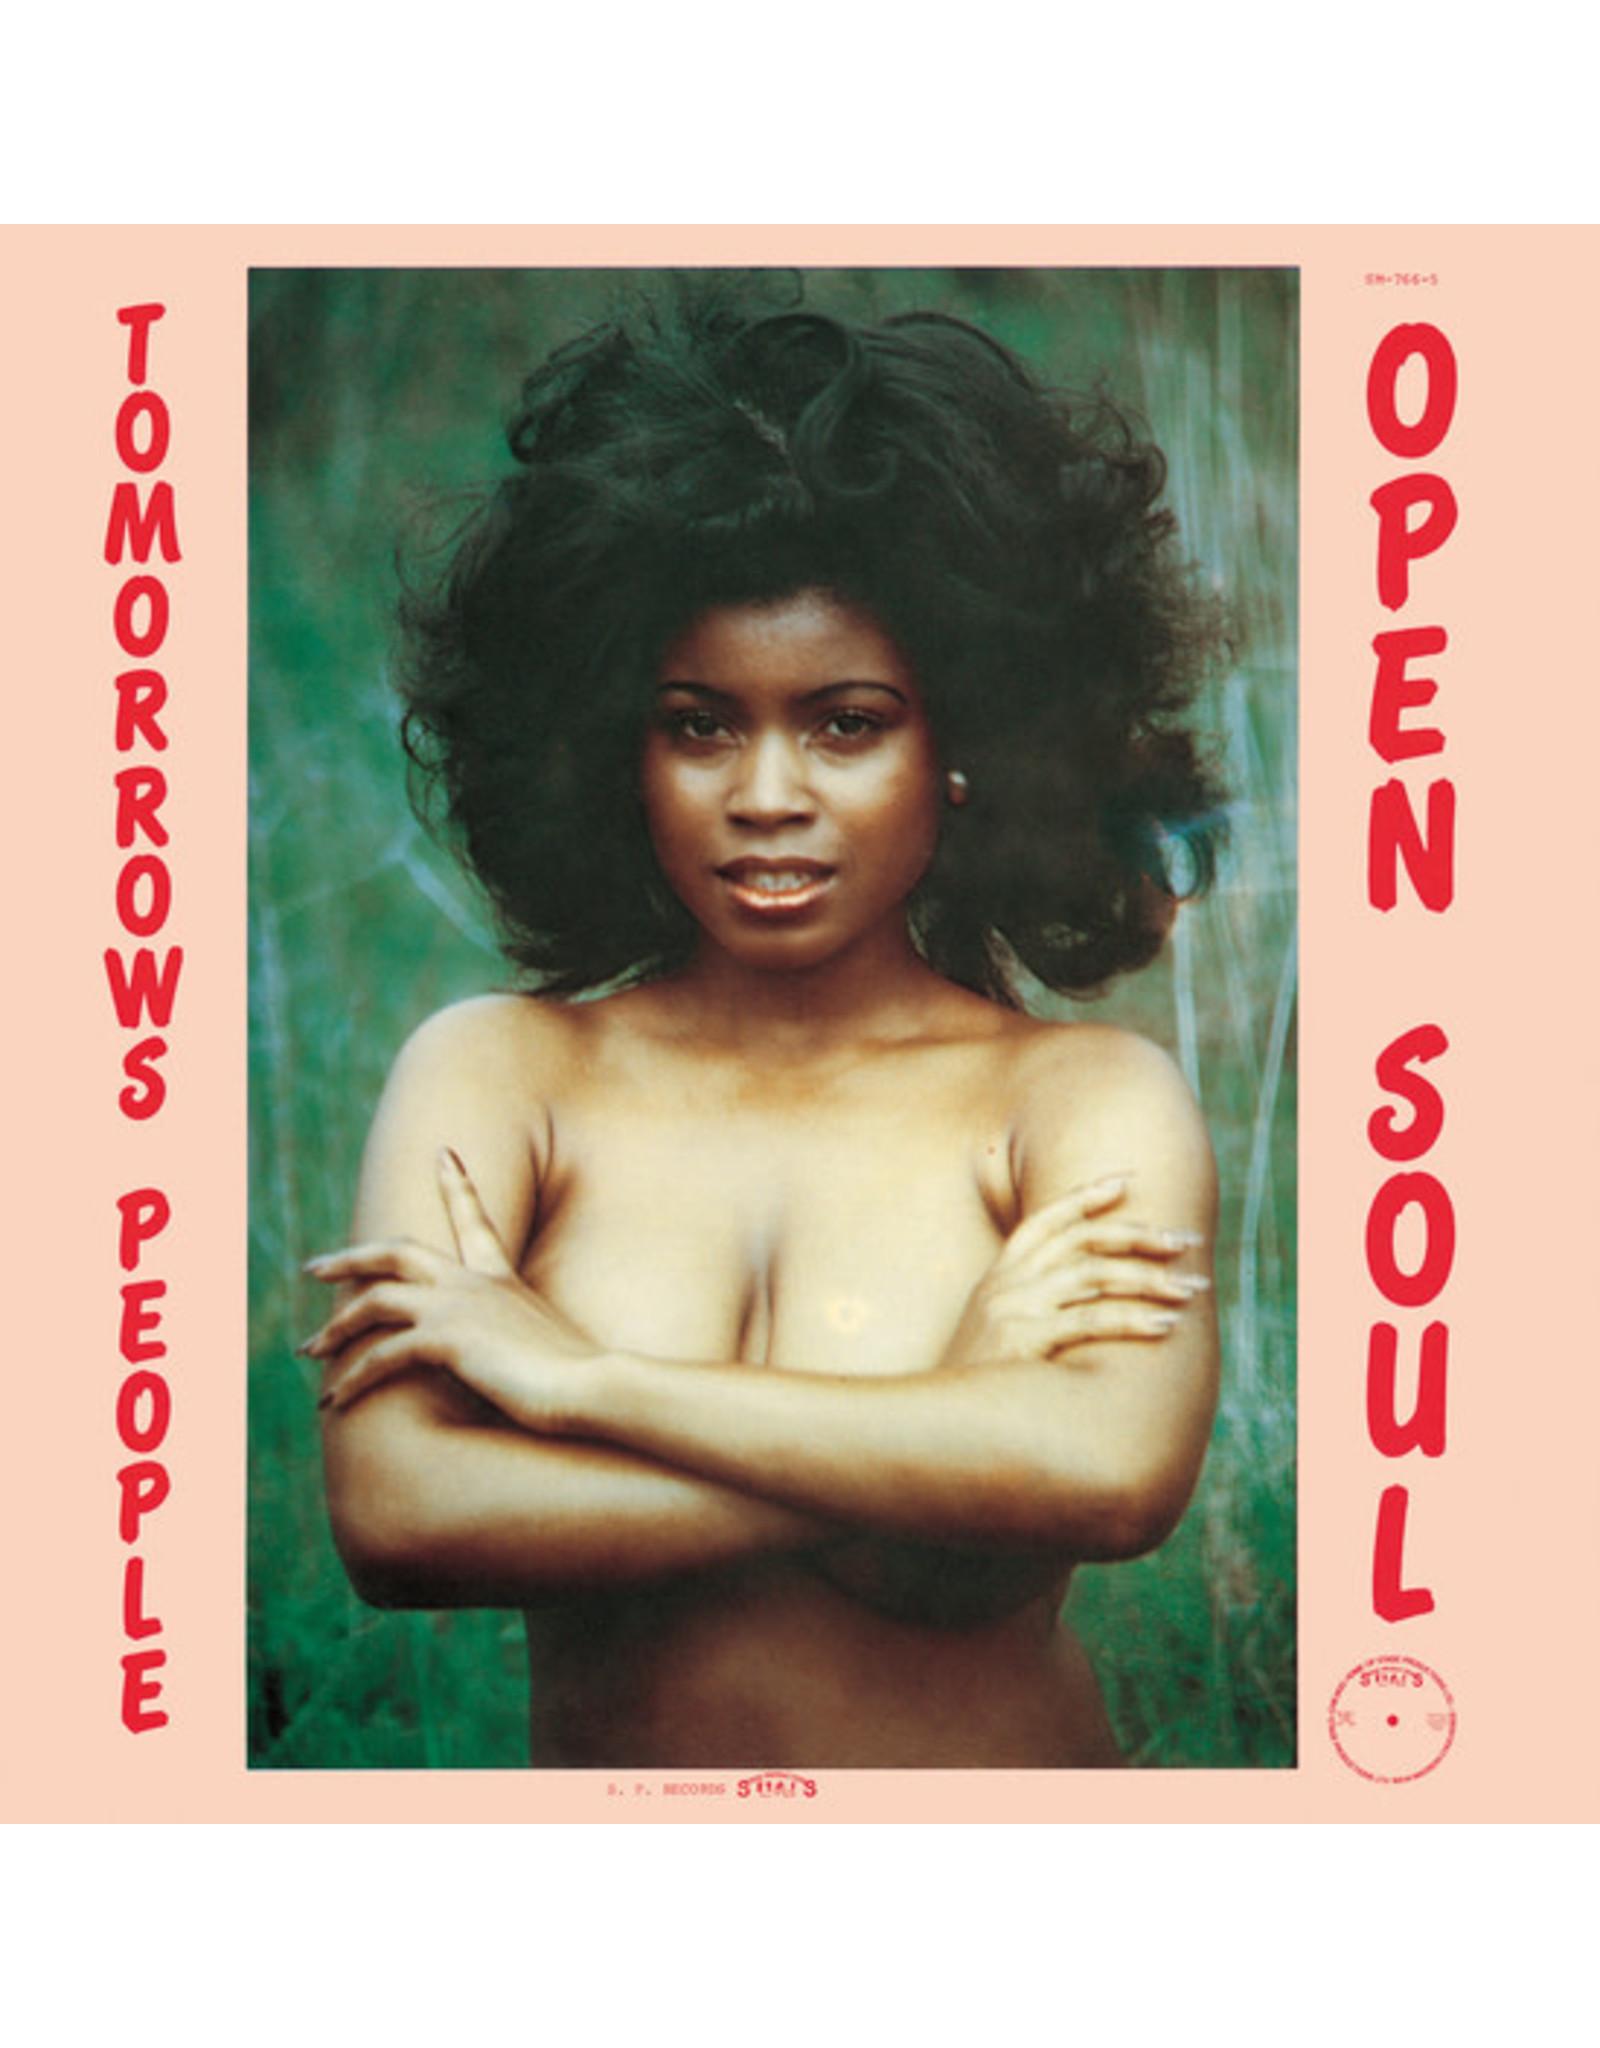 P-Vine Tomorrow's People: Open Soul LP